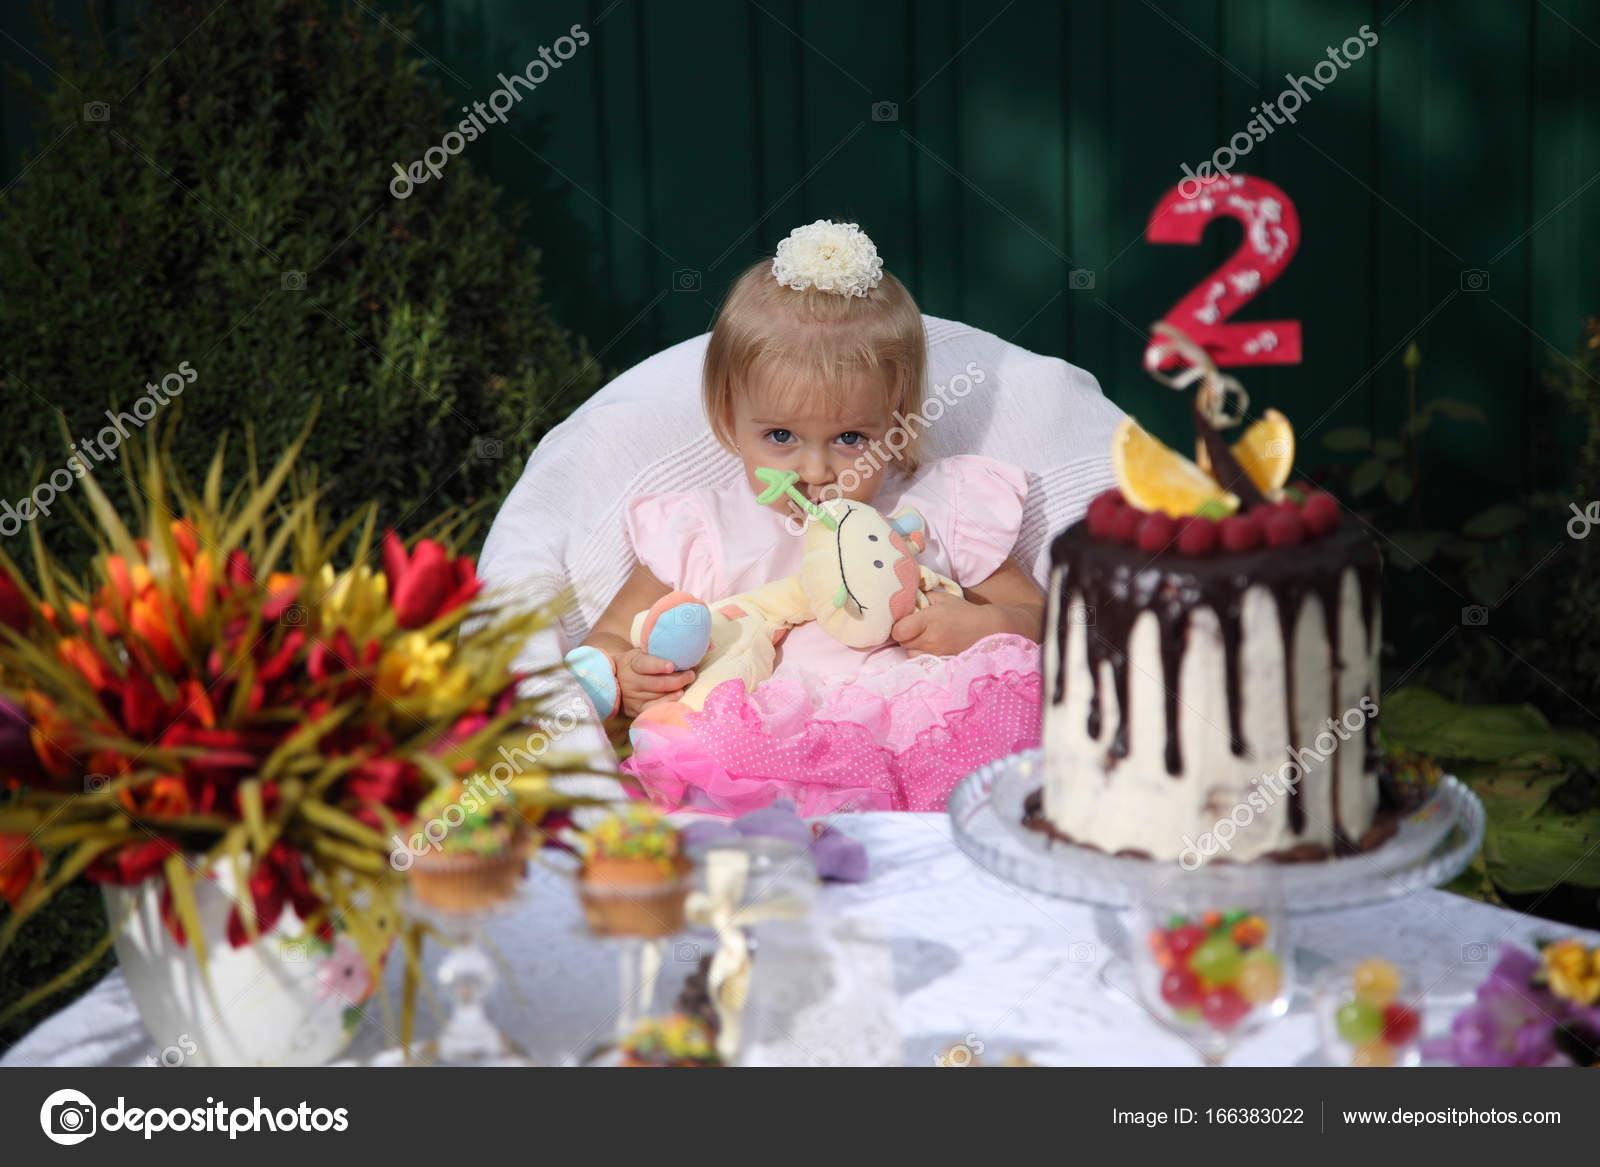 Fine Cake Designs For Girl 2Nd Birthday Girl Birthday A Little White Funny Birthday Cards Online Overcheapnameinfo